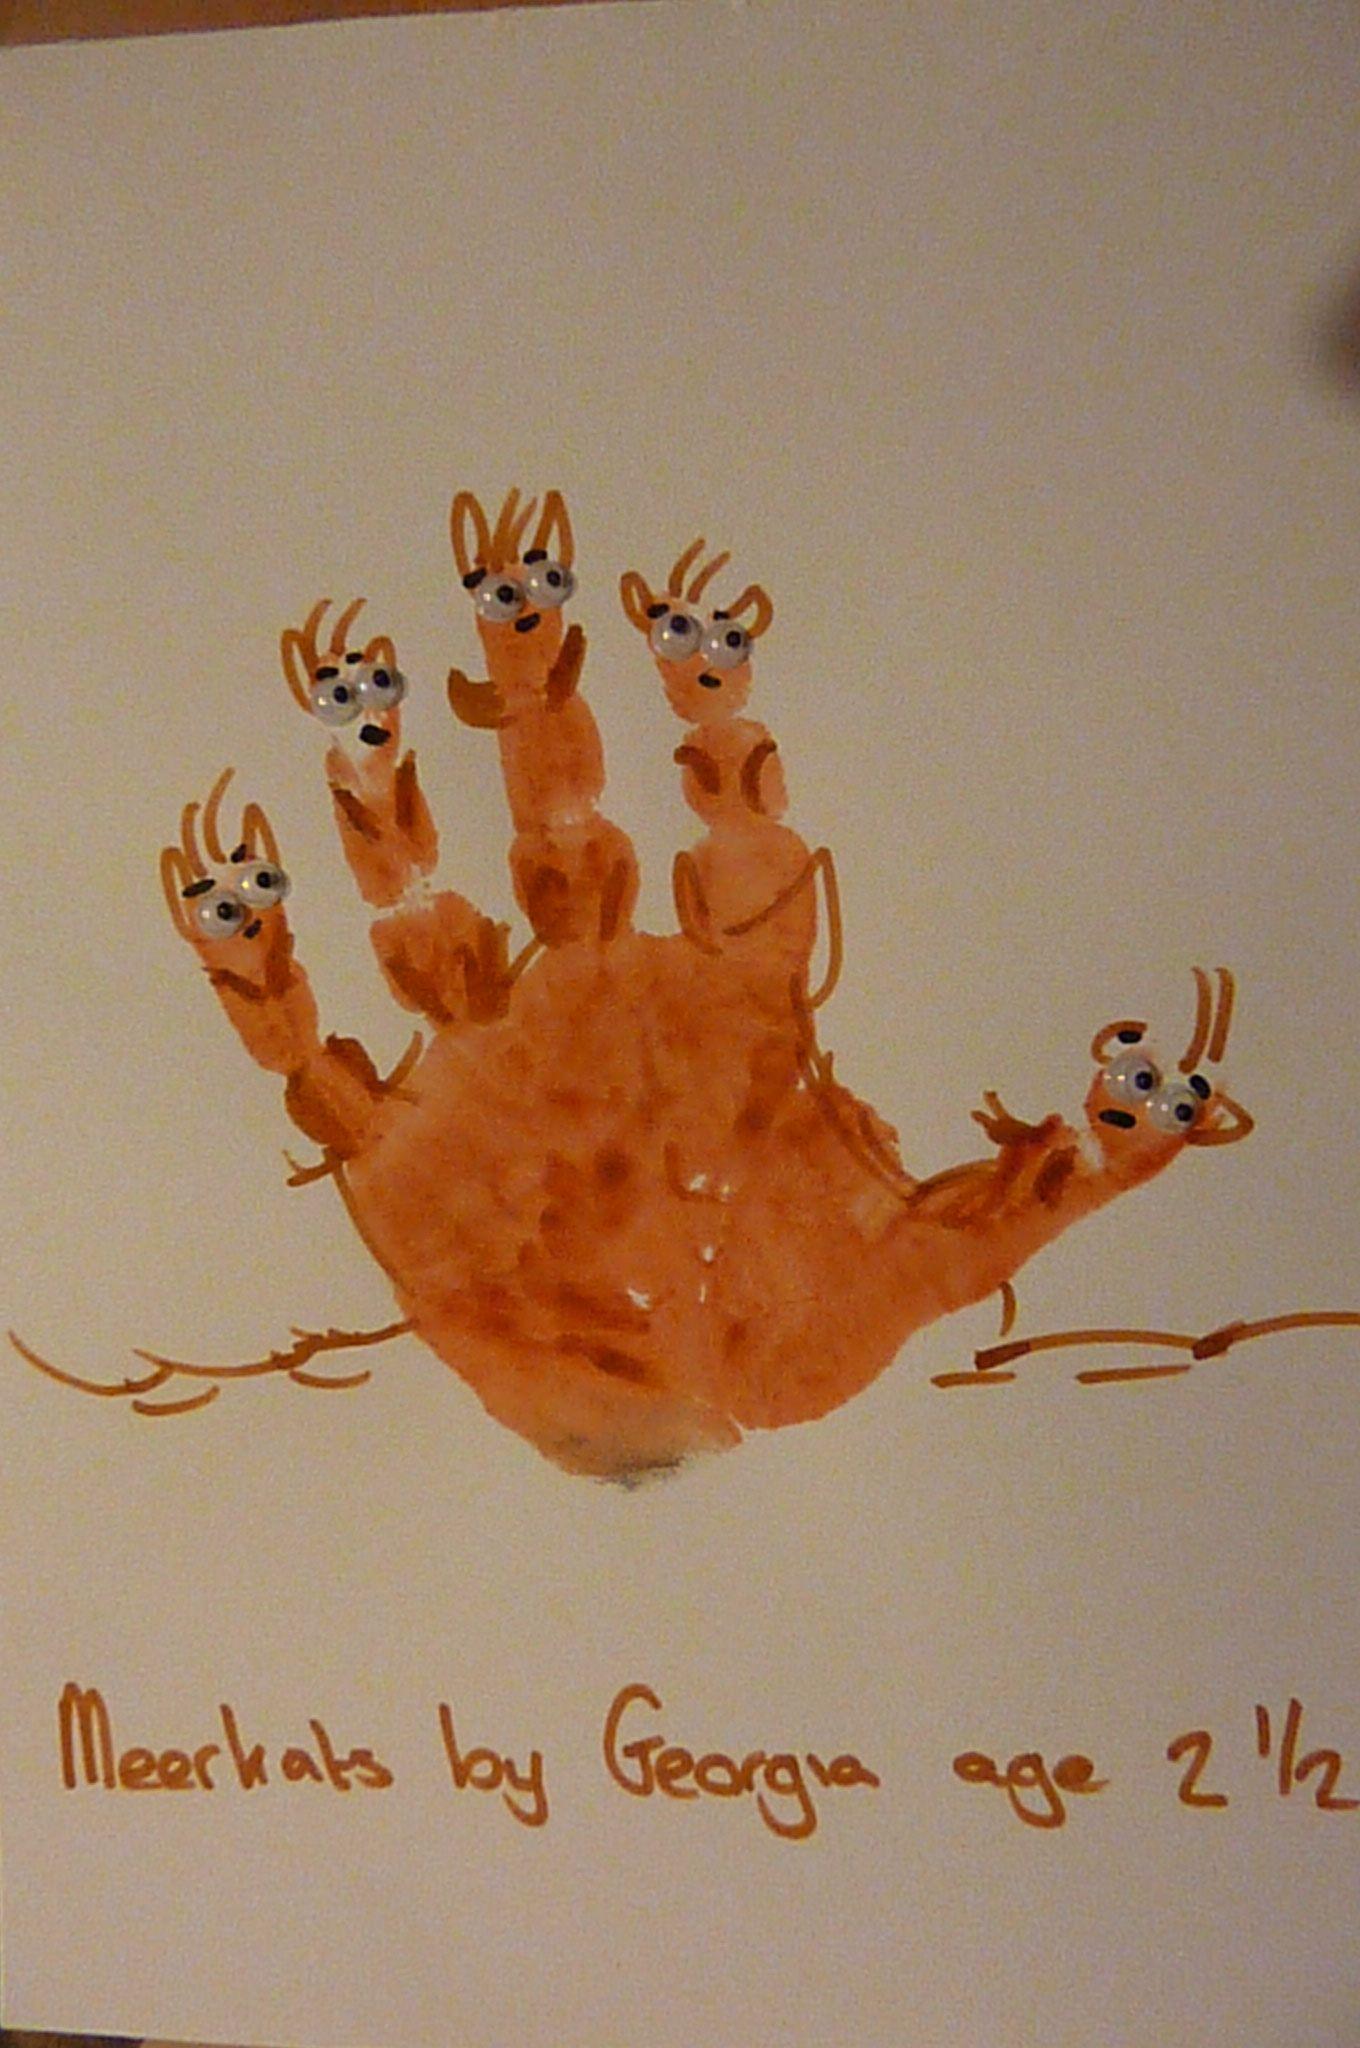 meerkat handprintgeorgia age 25  kids art projects